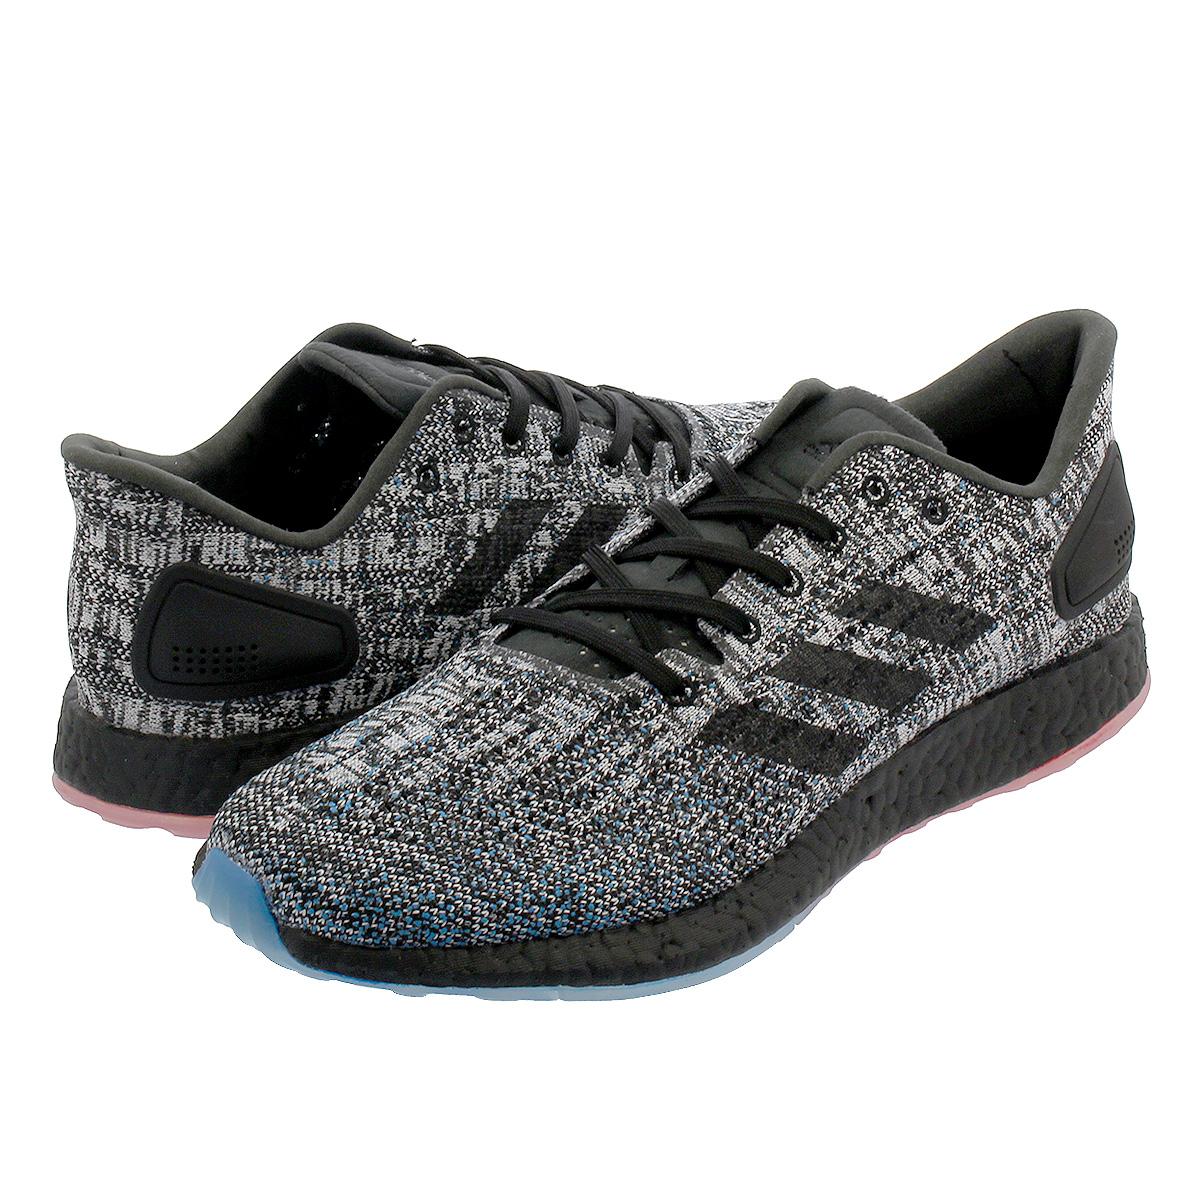 B37801 Boost Adidas Blackactive Pureboost Ltd Dpr Red Pure Core Blackcore 8Onw0Pk